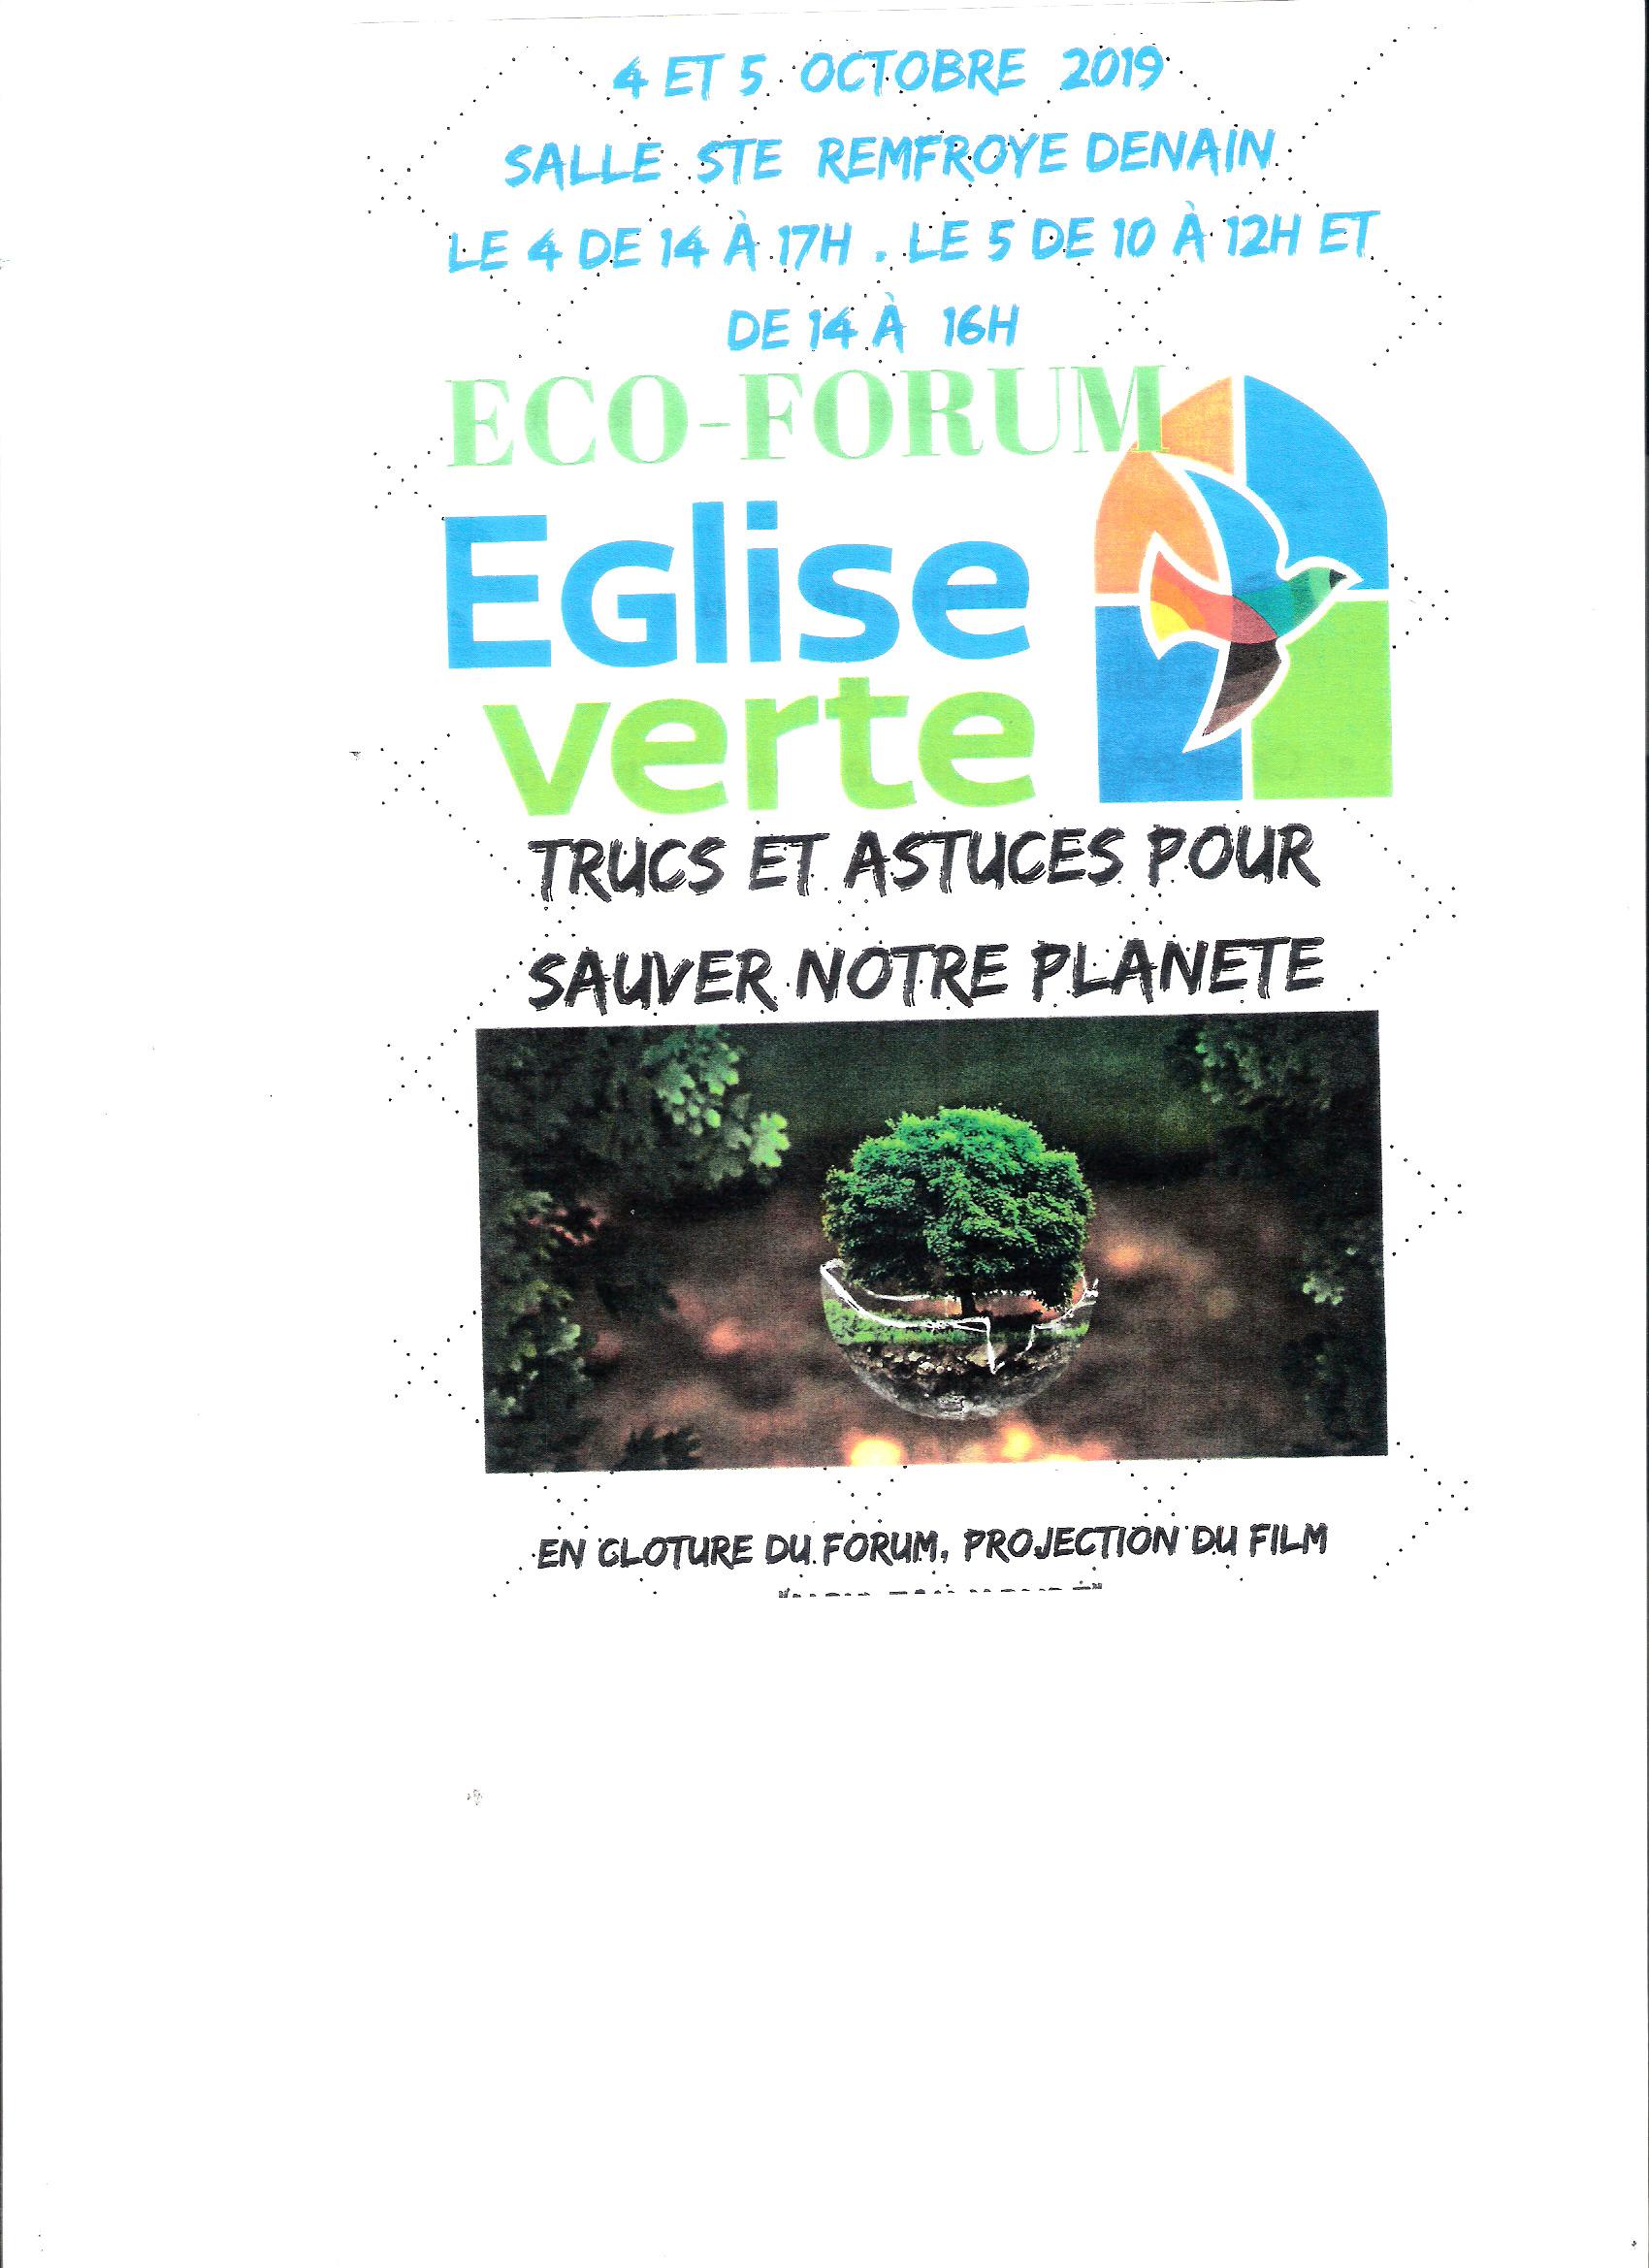 Eco Forum Eglise verte